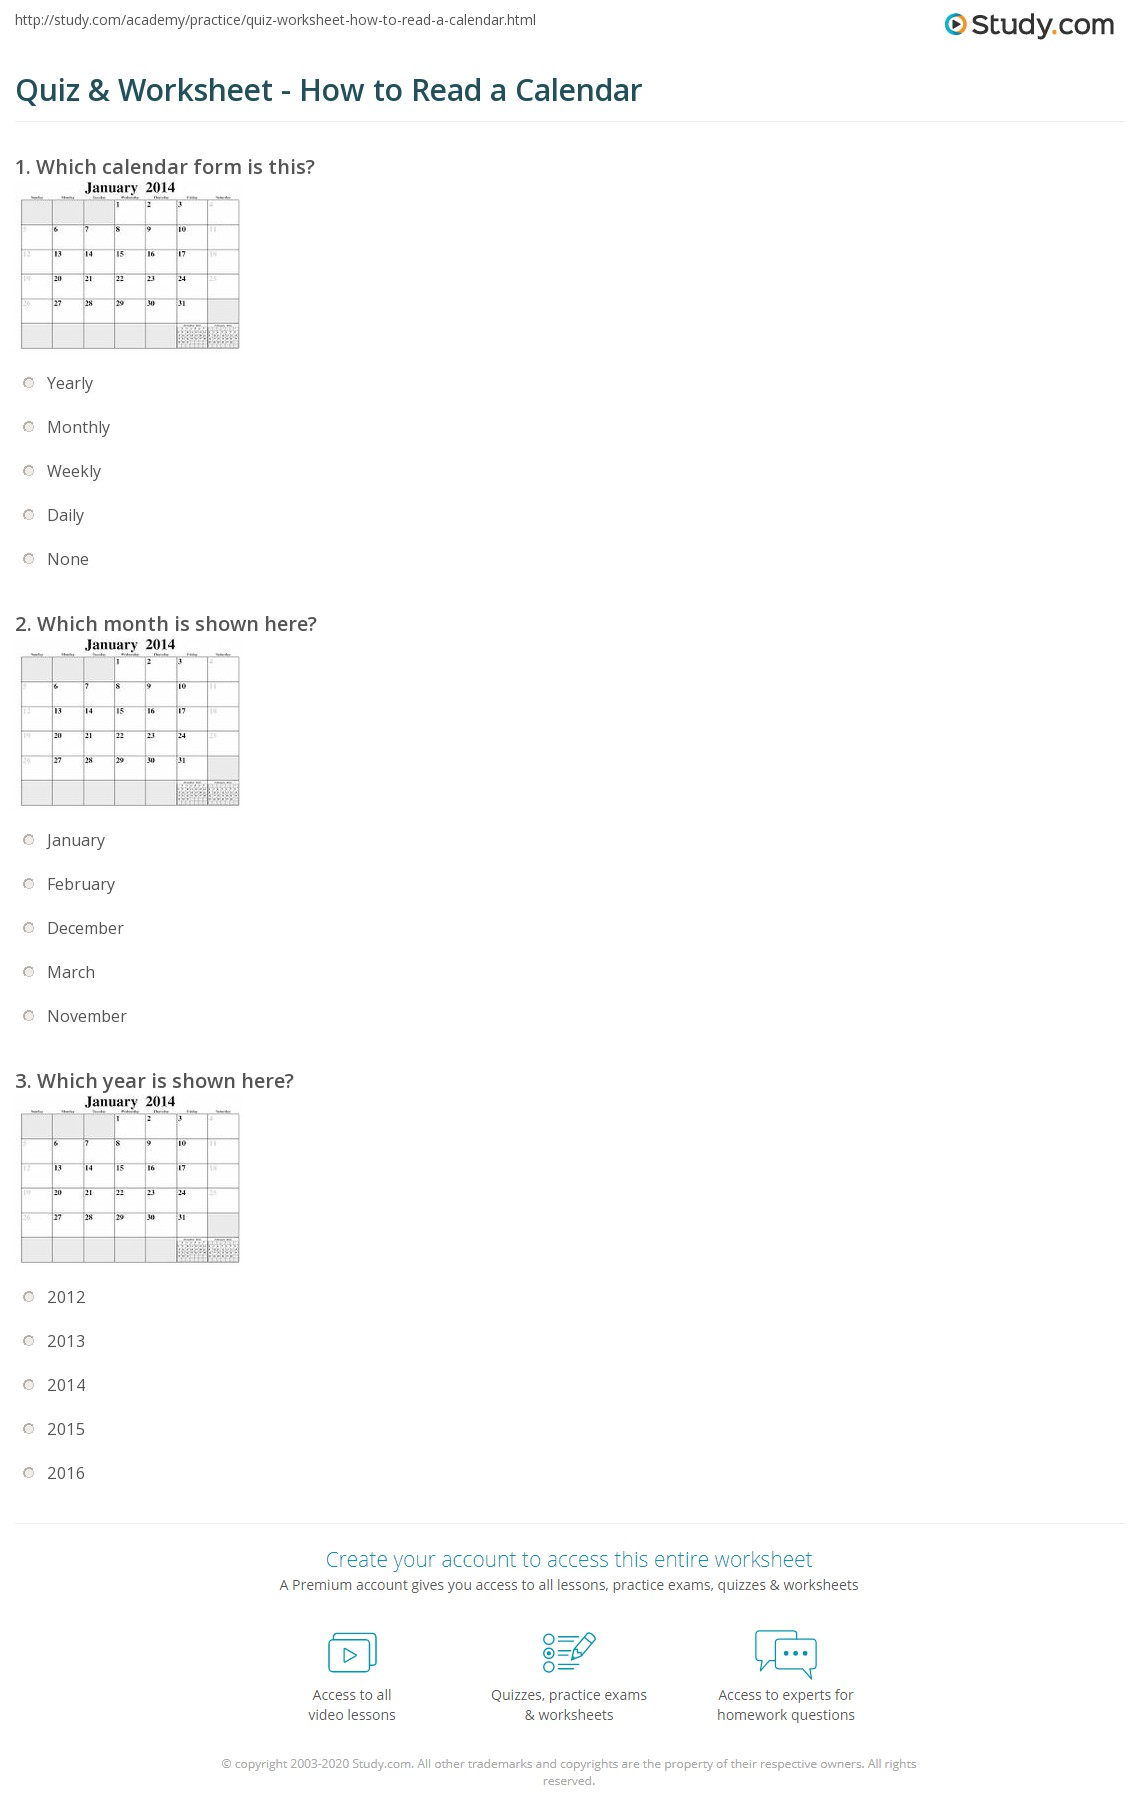 Worksheet Works Hourly Planner - Syndeomedia